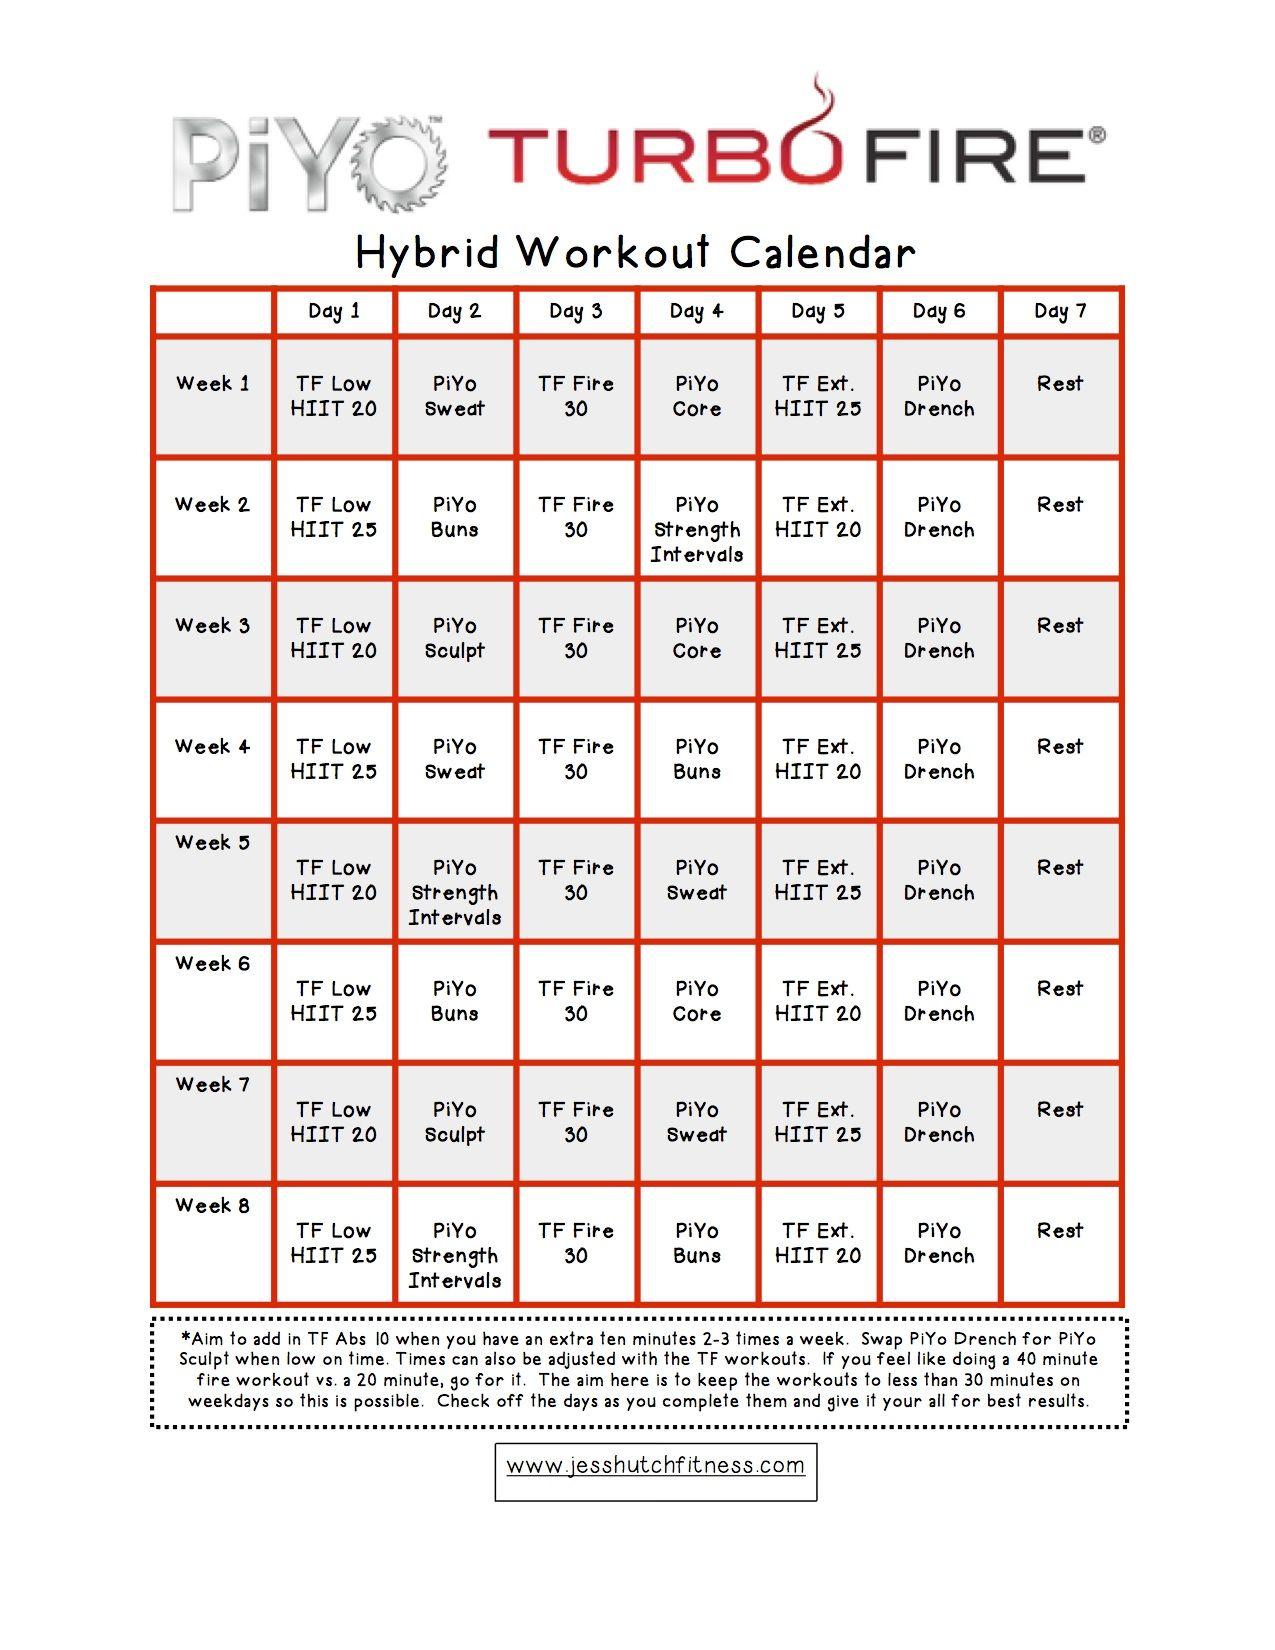 Turbo Fire Calendar Week 5 | Calendar Printables Free intended for Printable Piyo Calendar